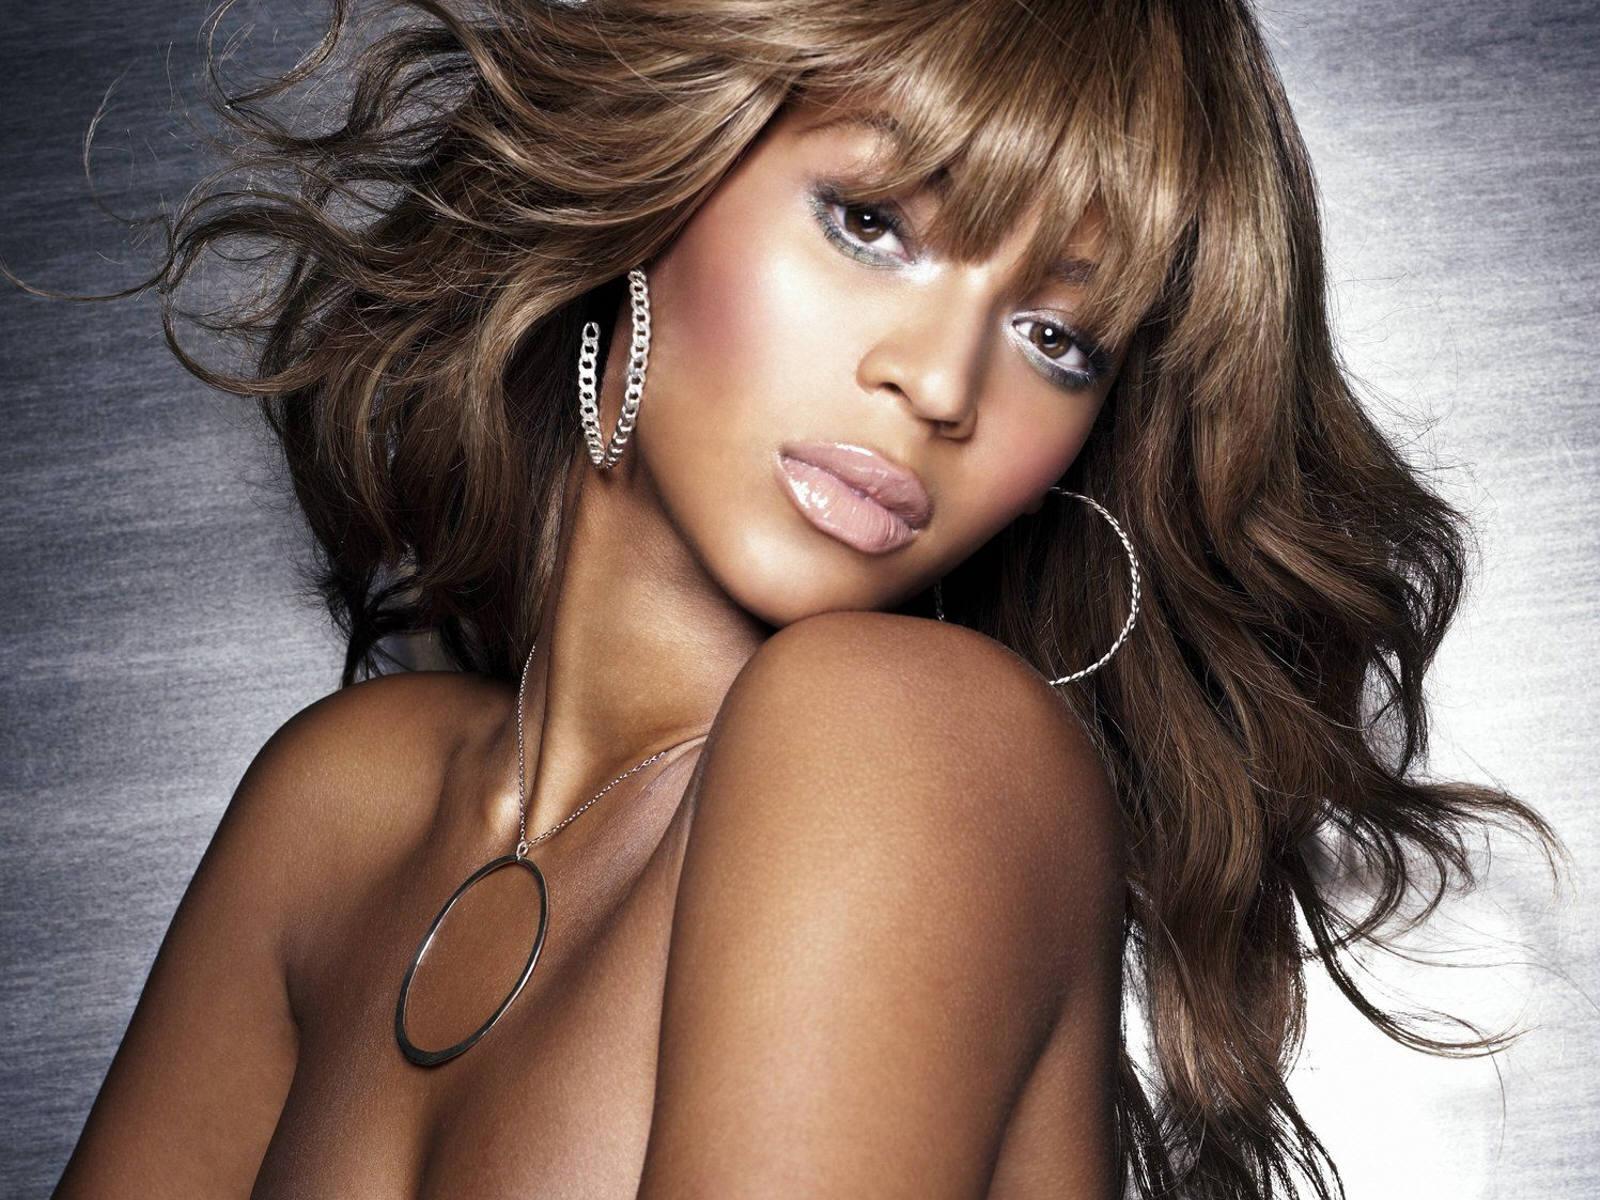 http://3.bp.blogspot.com/-hPUI8p7uGuA/Tdq8bR_Yd9I/AAAAAAAAIyE/8pmtdVfk4Vs/s1600/85167_Beyonce_Knowles_35_123_392lo.jpg